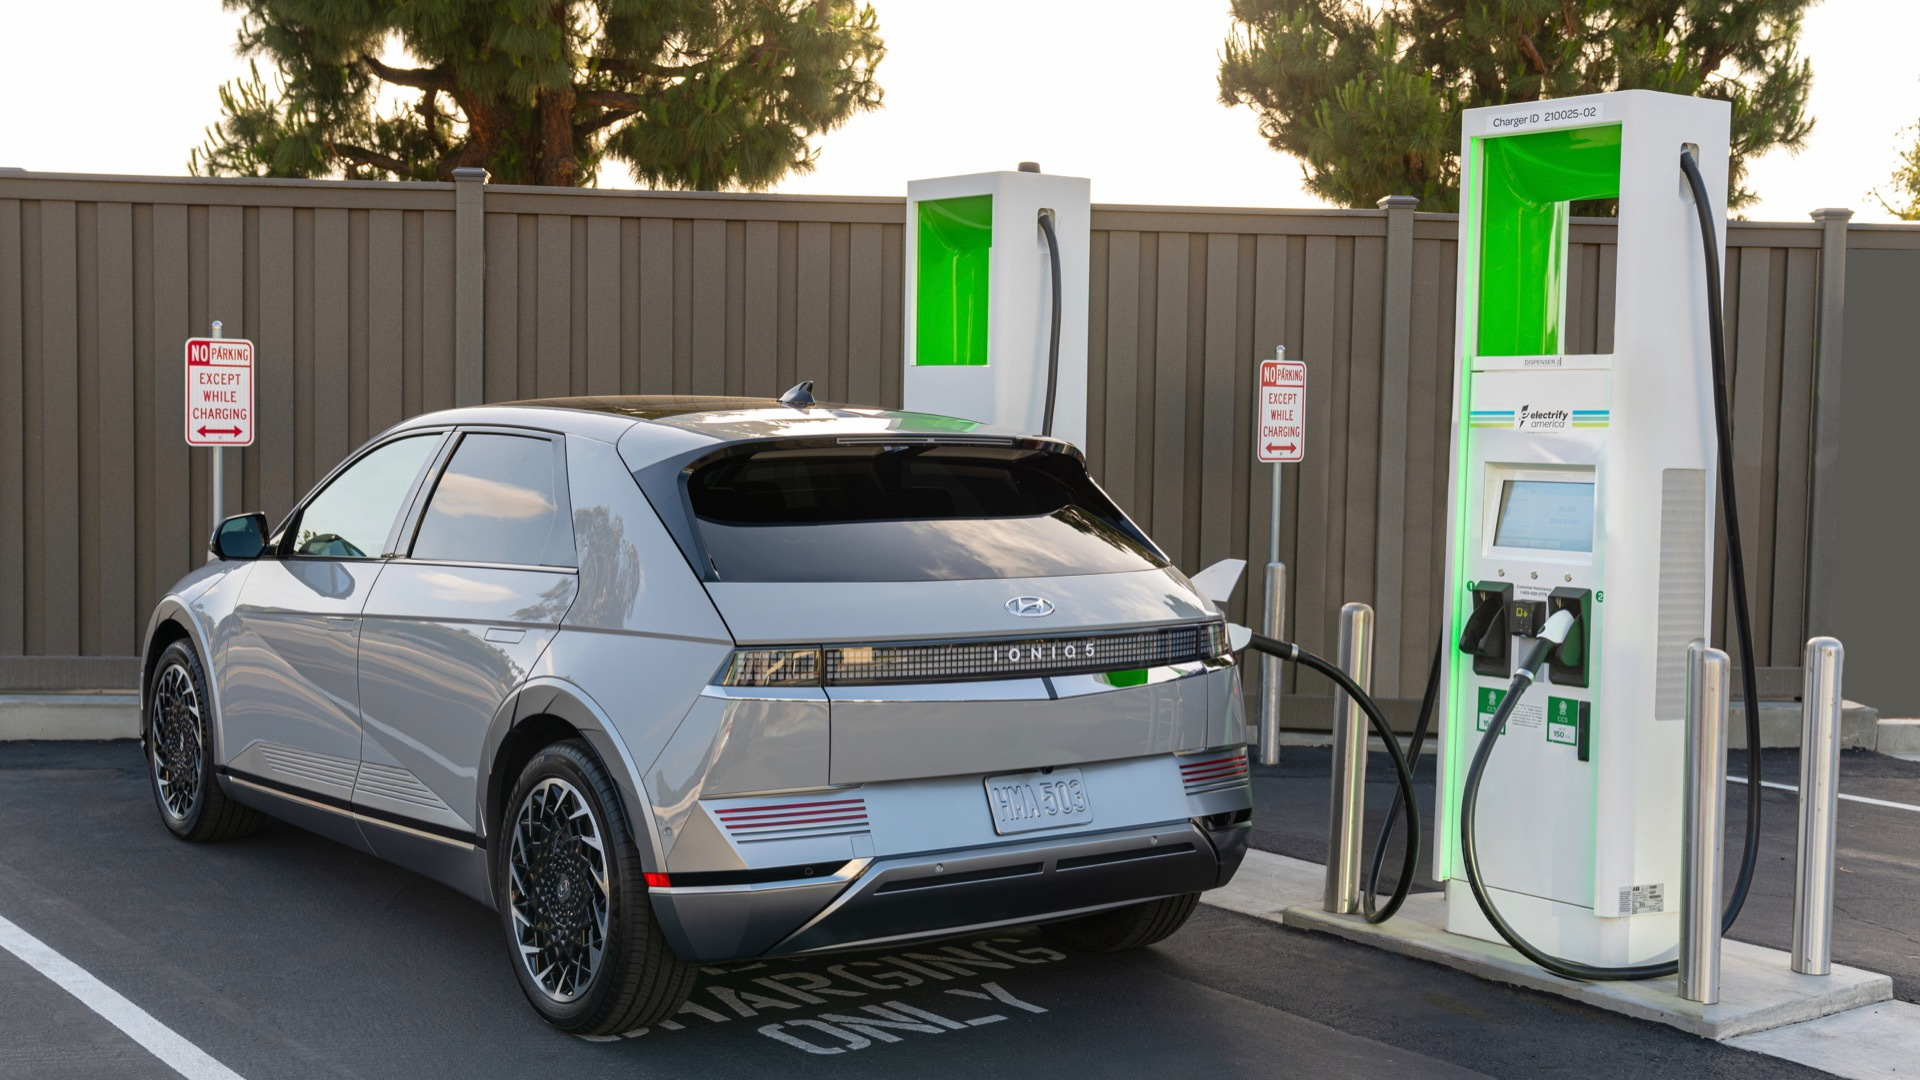 2022 Hyundai IONIQ 5 at Electrify America DC fast-charging station